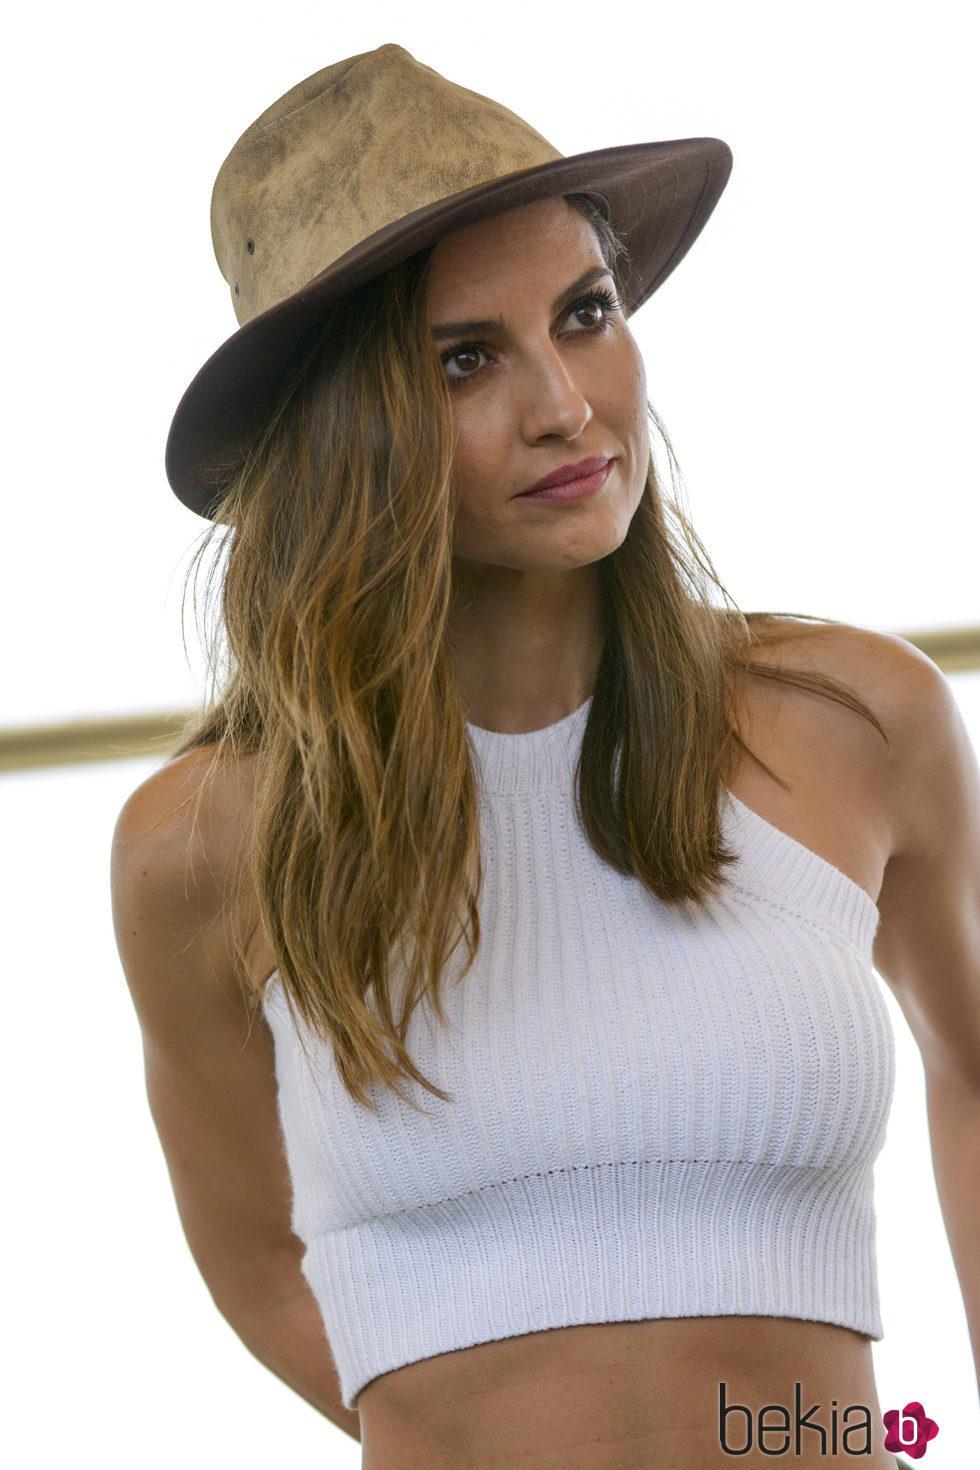 Ariadne Artiles con un sombrero de paja y pelo suelto